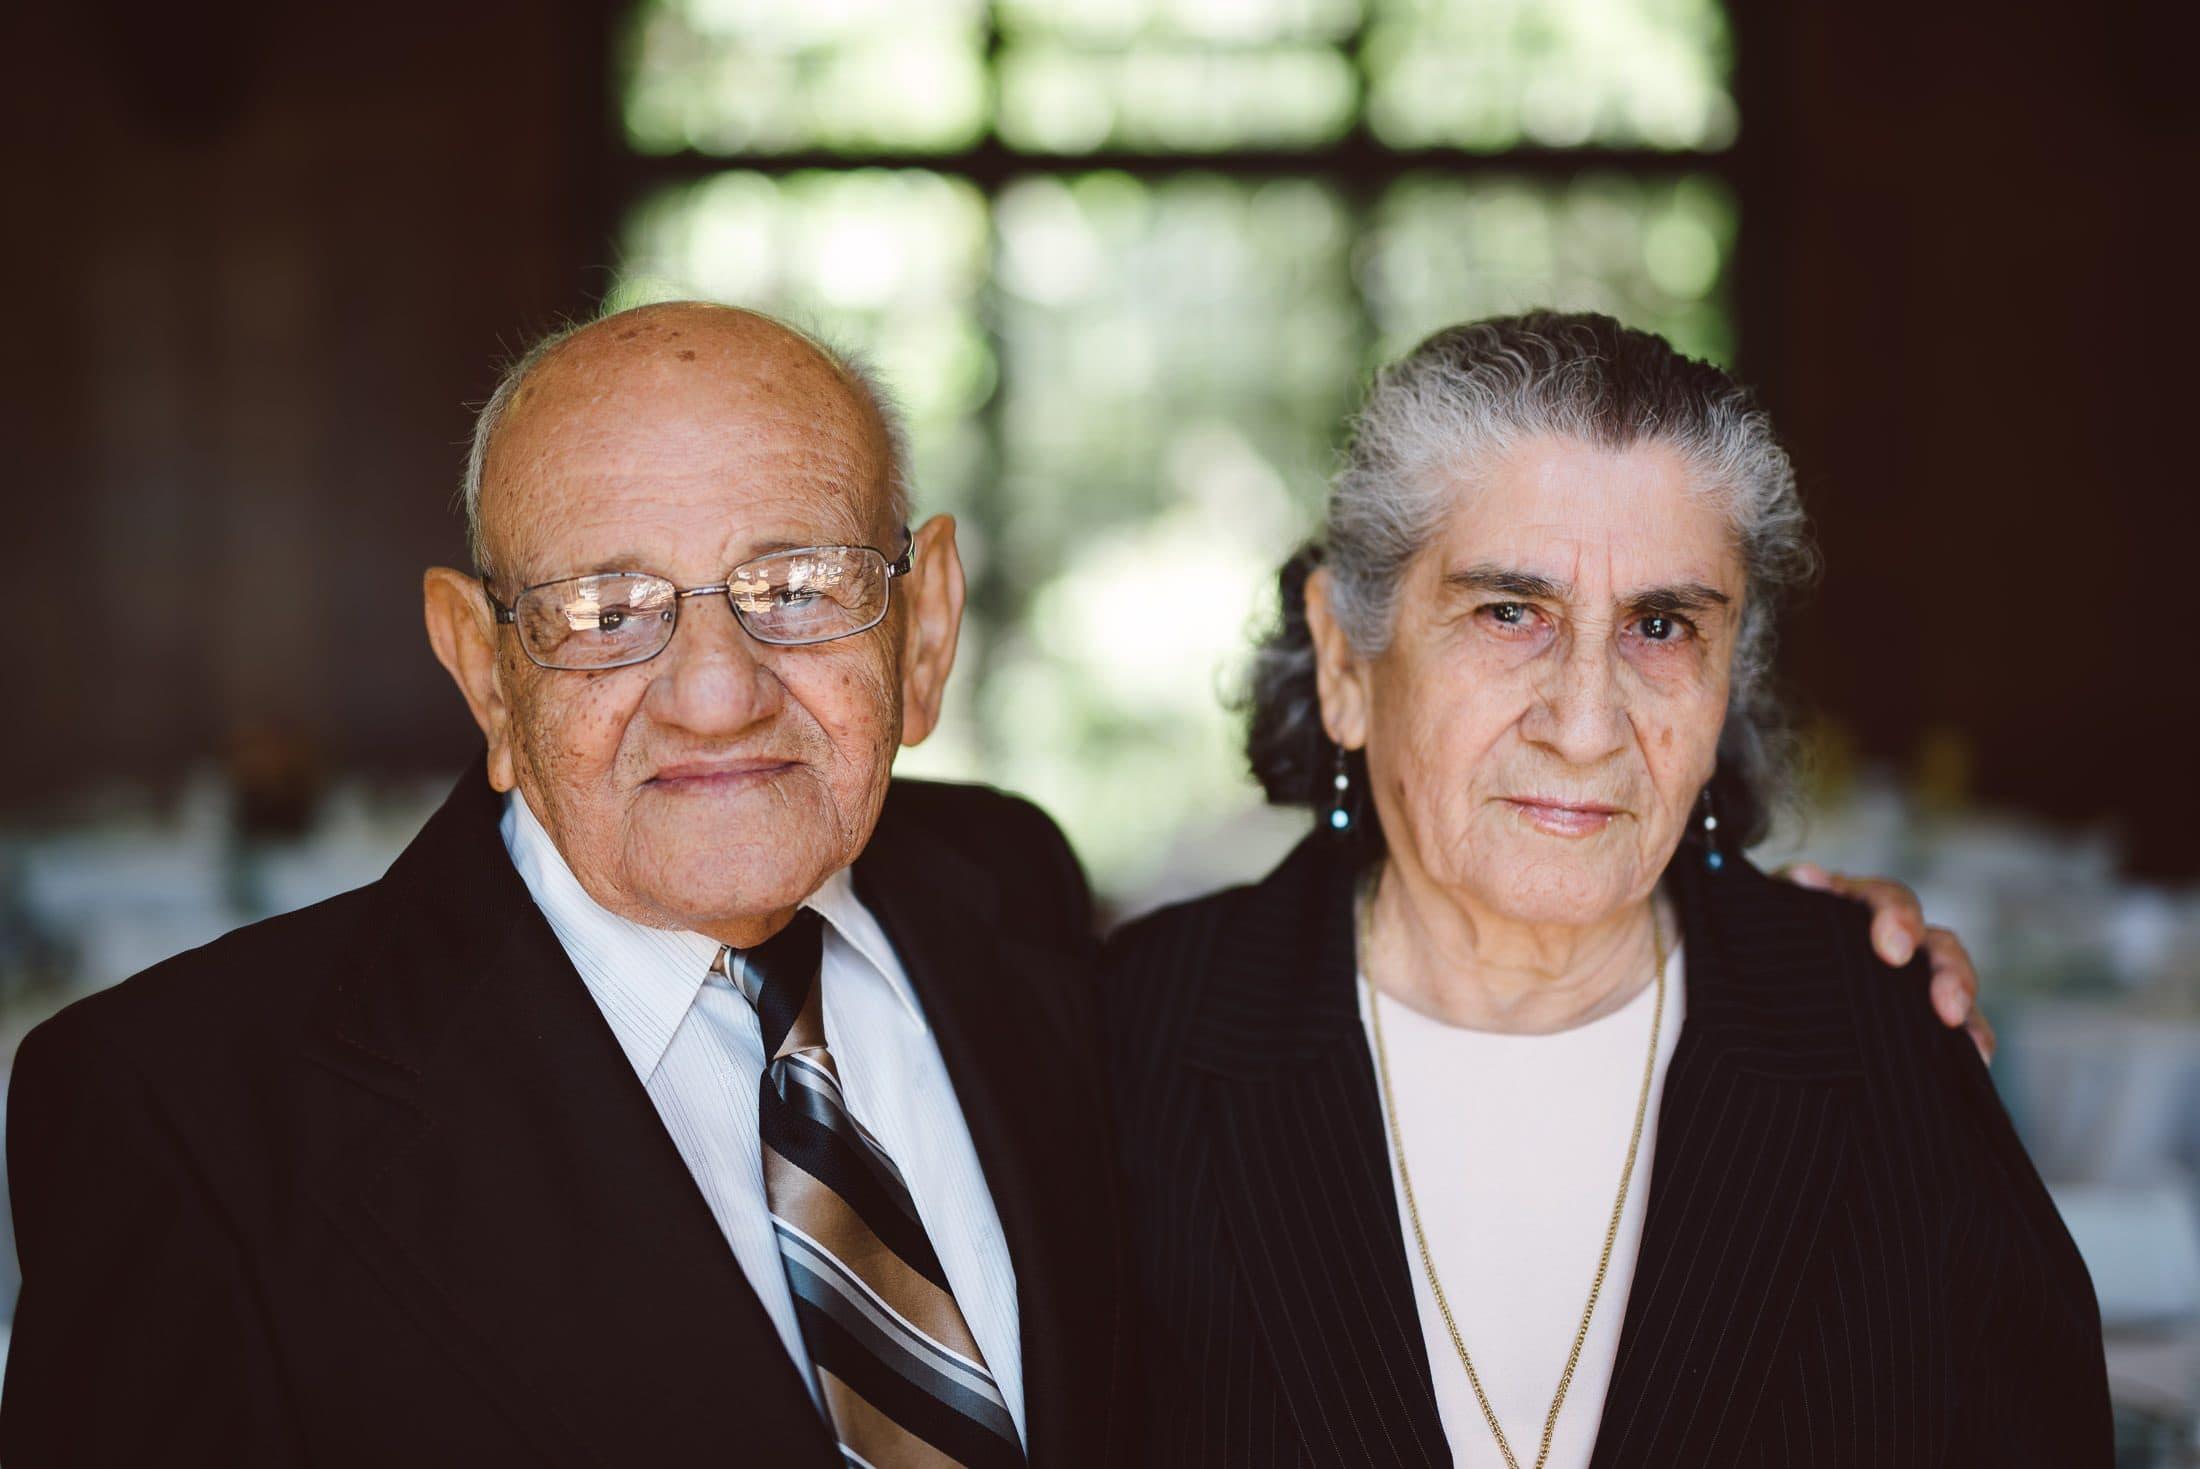 Grandparents portrait at brazil room wedding